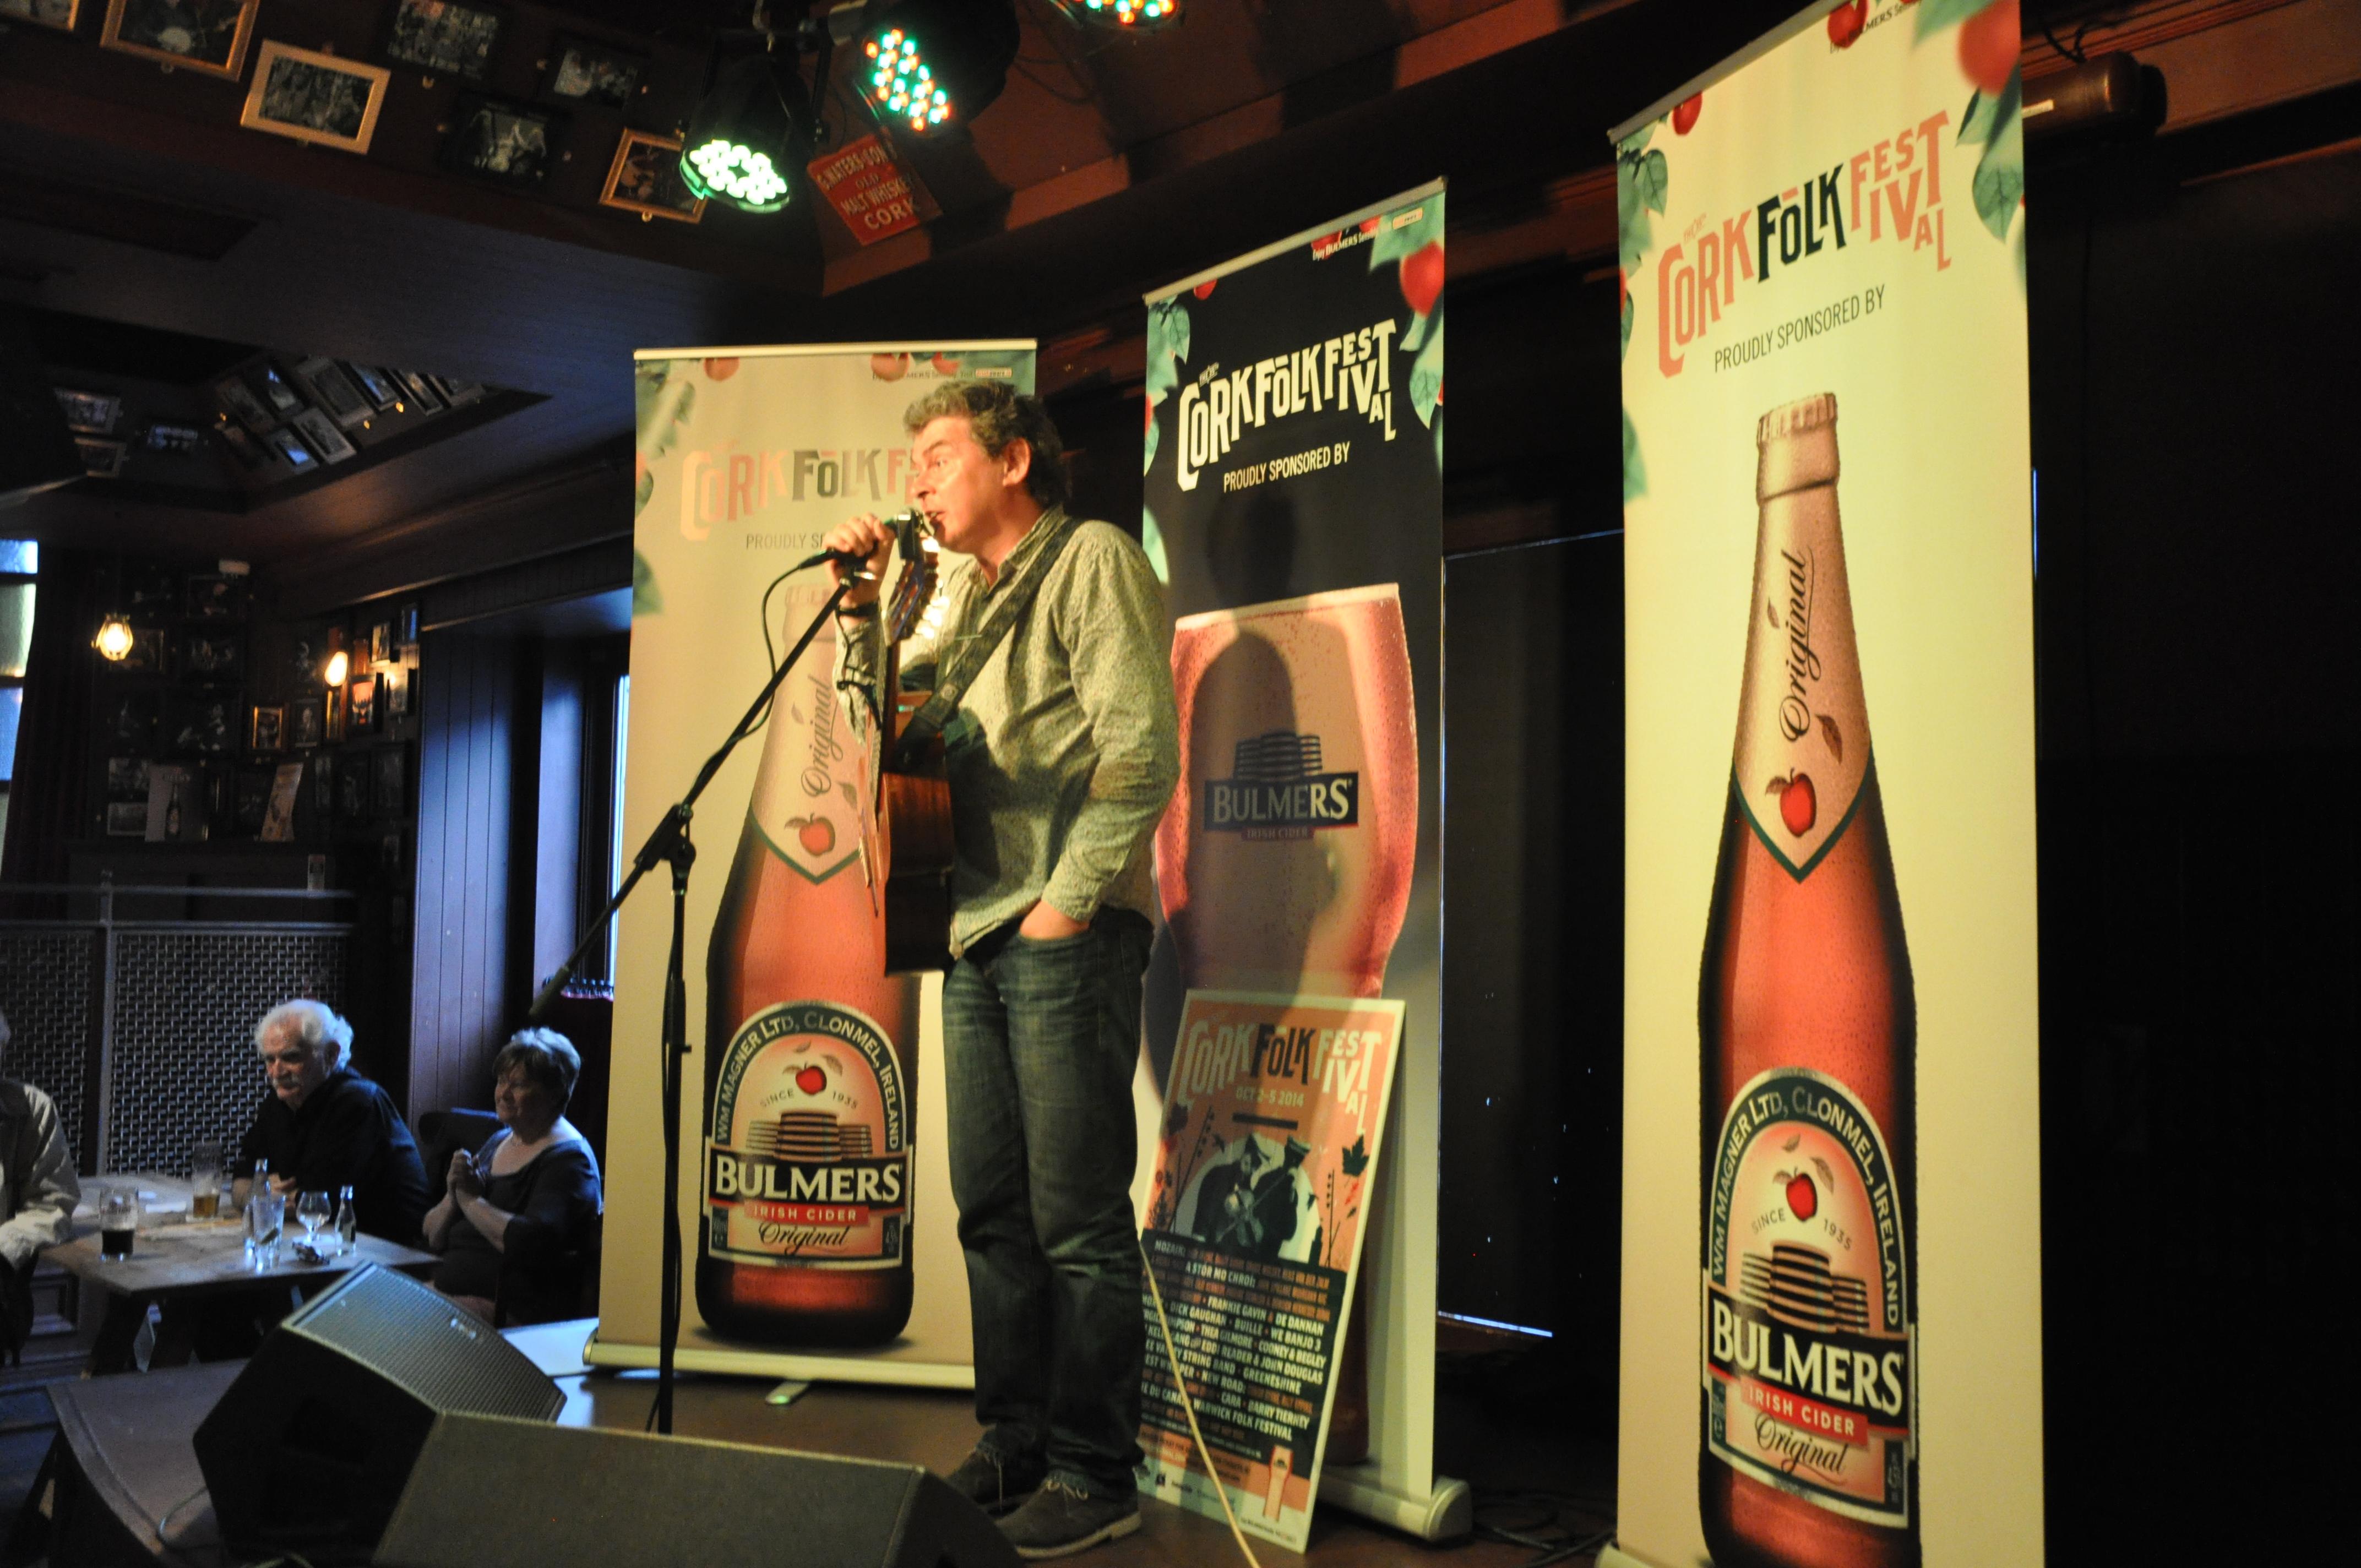 John Spilllane at  Cork Folk Fest launch